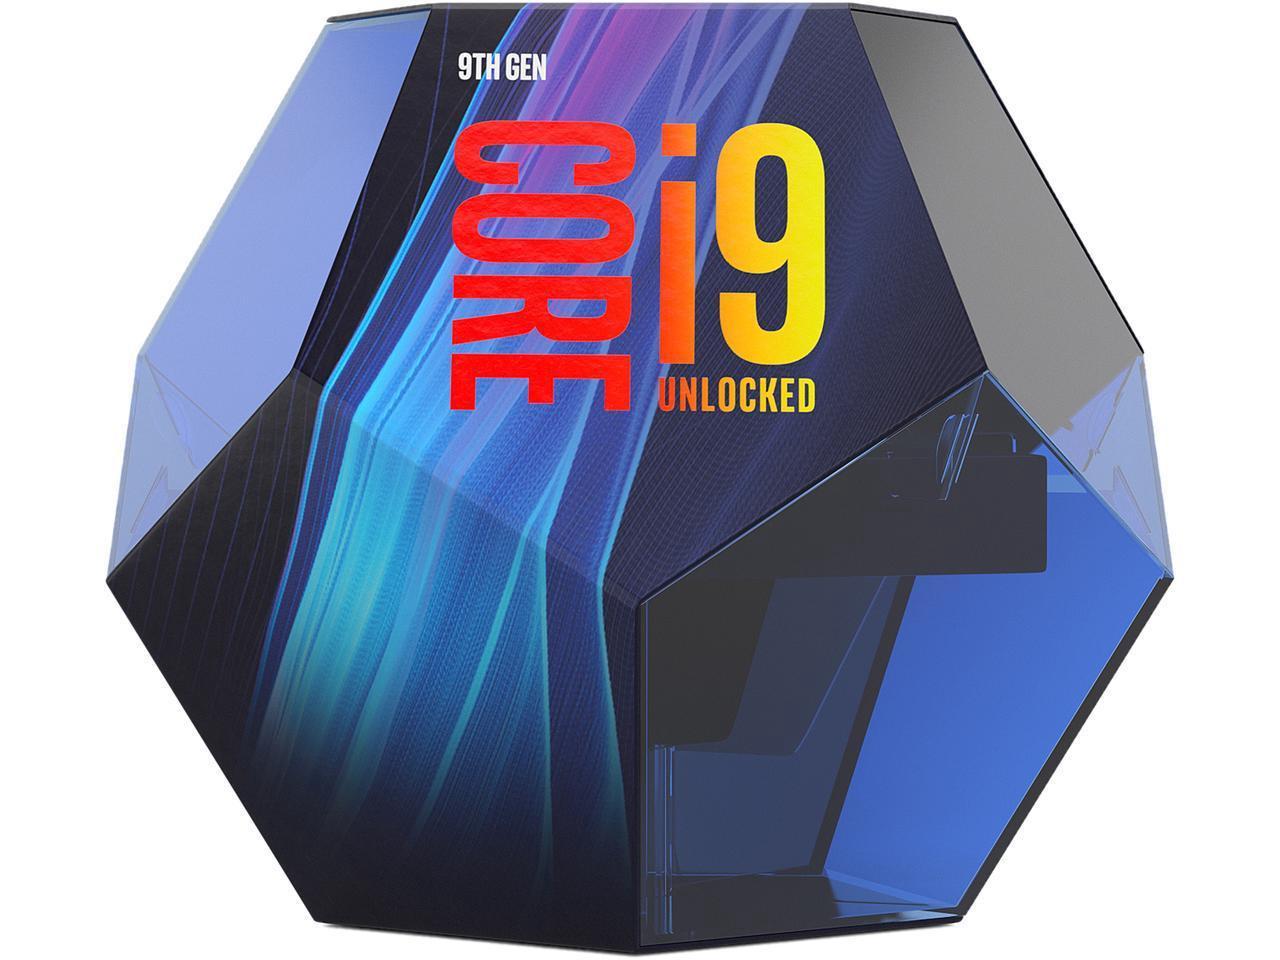 News Posts matching 'Intel Core' | TechPowerUp